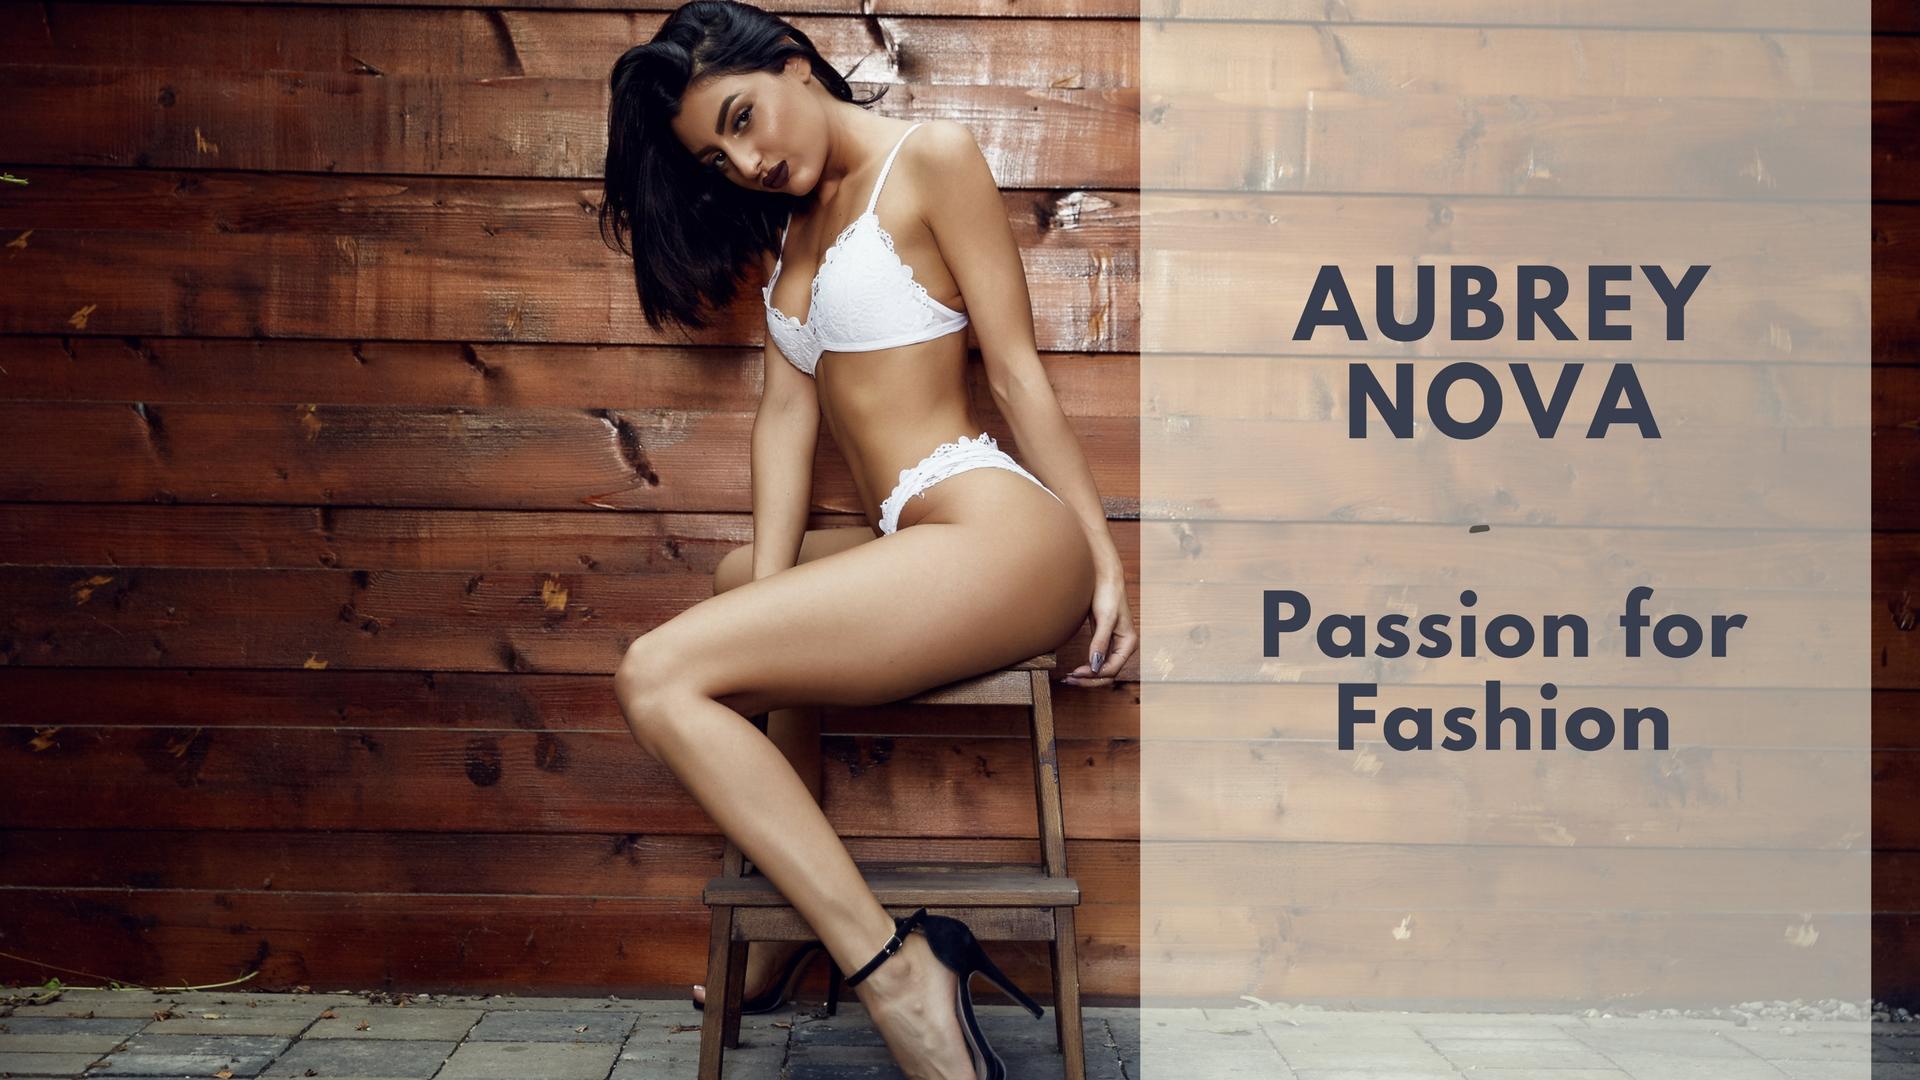 Aubrey Nova – Passion for Fashion